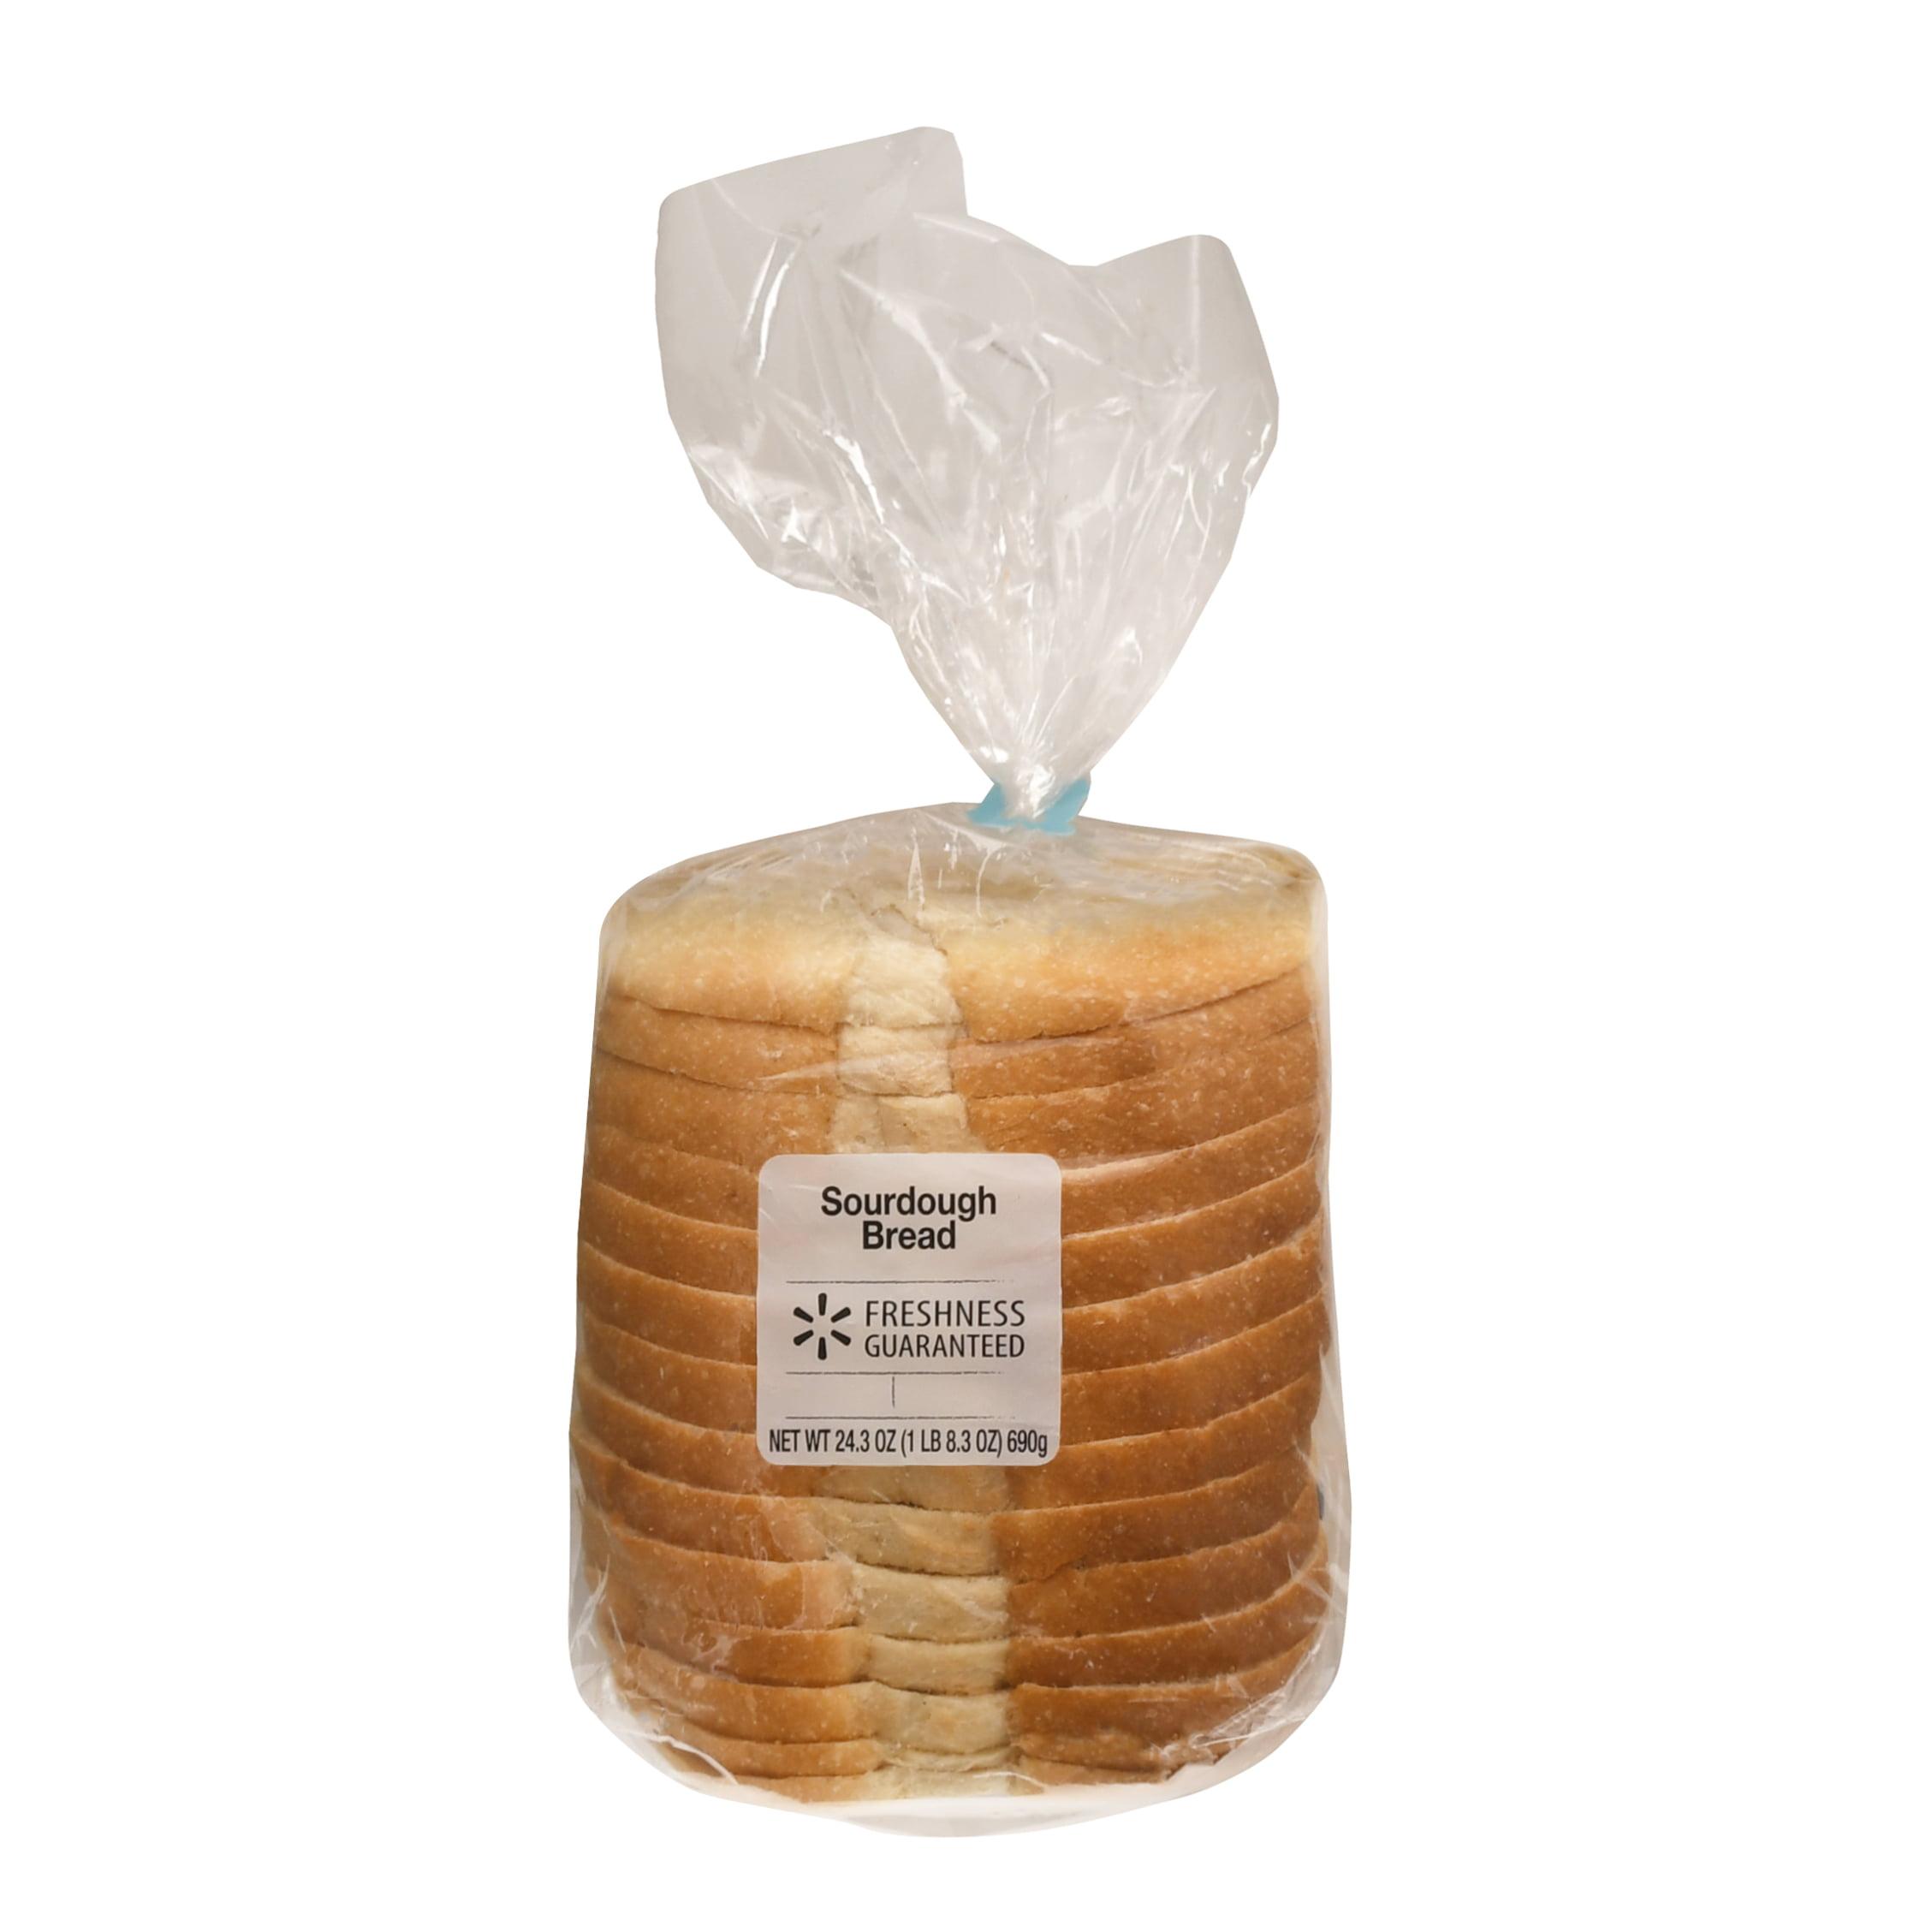 Freshness Guaranteed Sourdough Bread 24 3 Oz Walmart Com Walmart Com